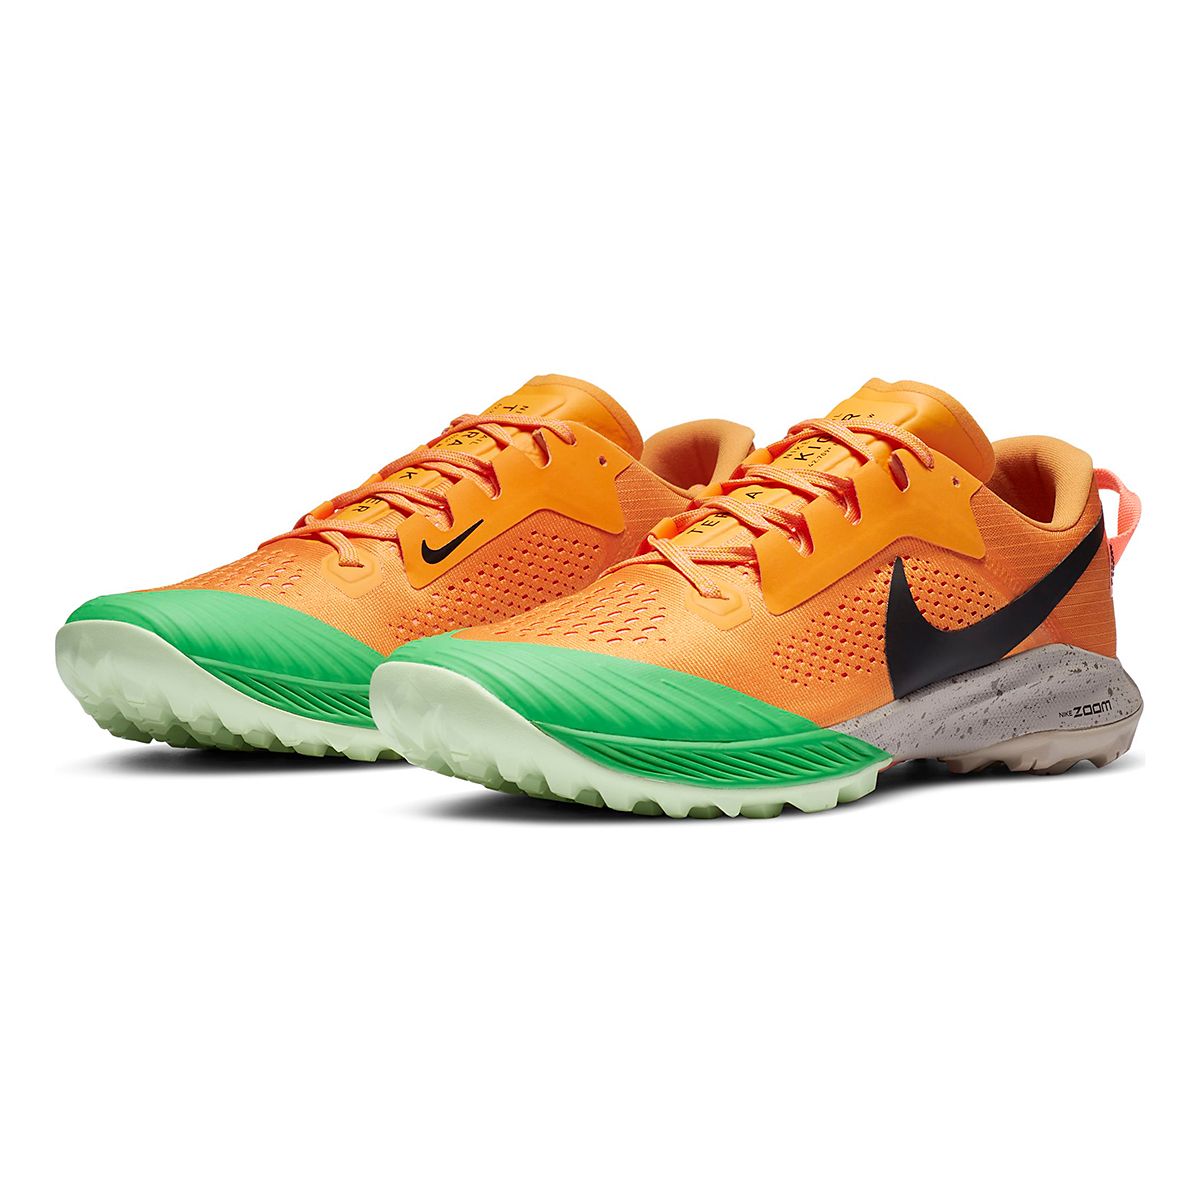 Men's Nike Air Zoom Terra Kiger 6 Trail Running Shoe - Color: Kumquat/Black/Pink Green Spark - Size: 6 - Width: Regular, Kumquat/Black/Pink Green Spark, large, image 3